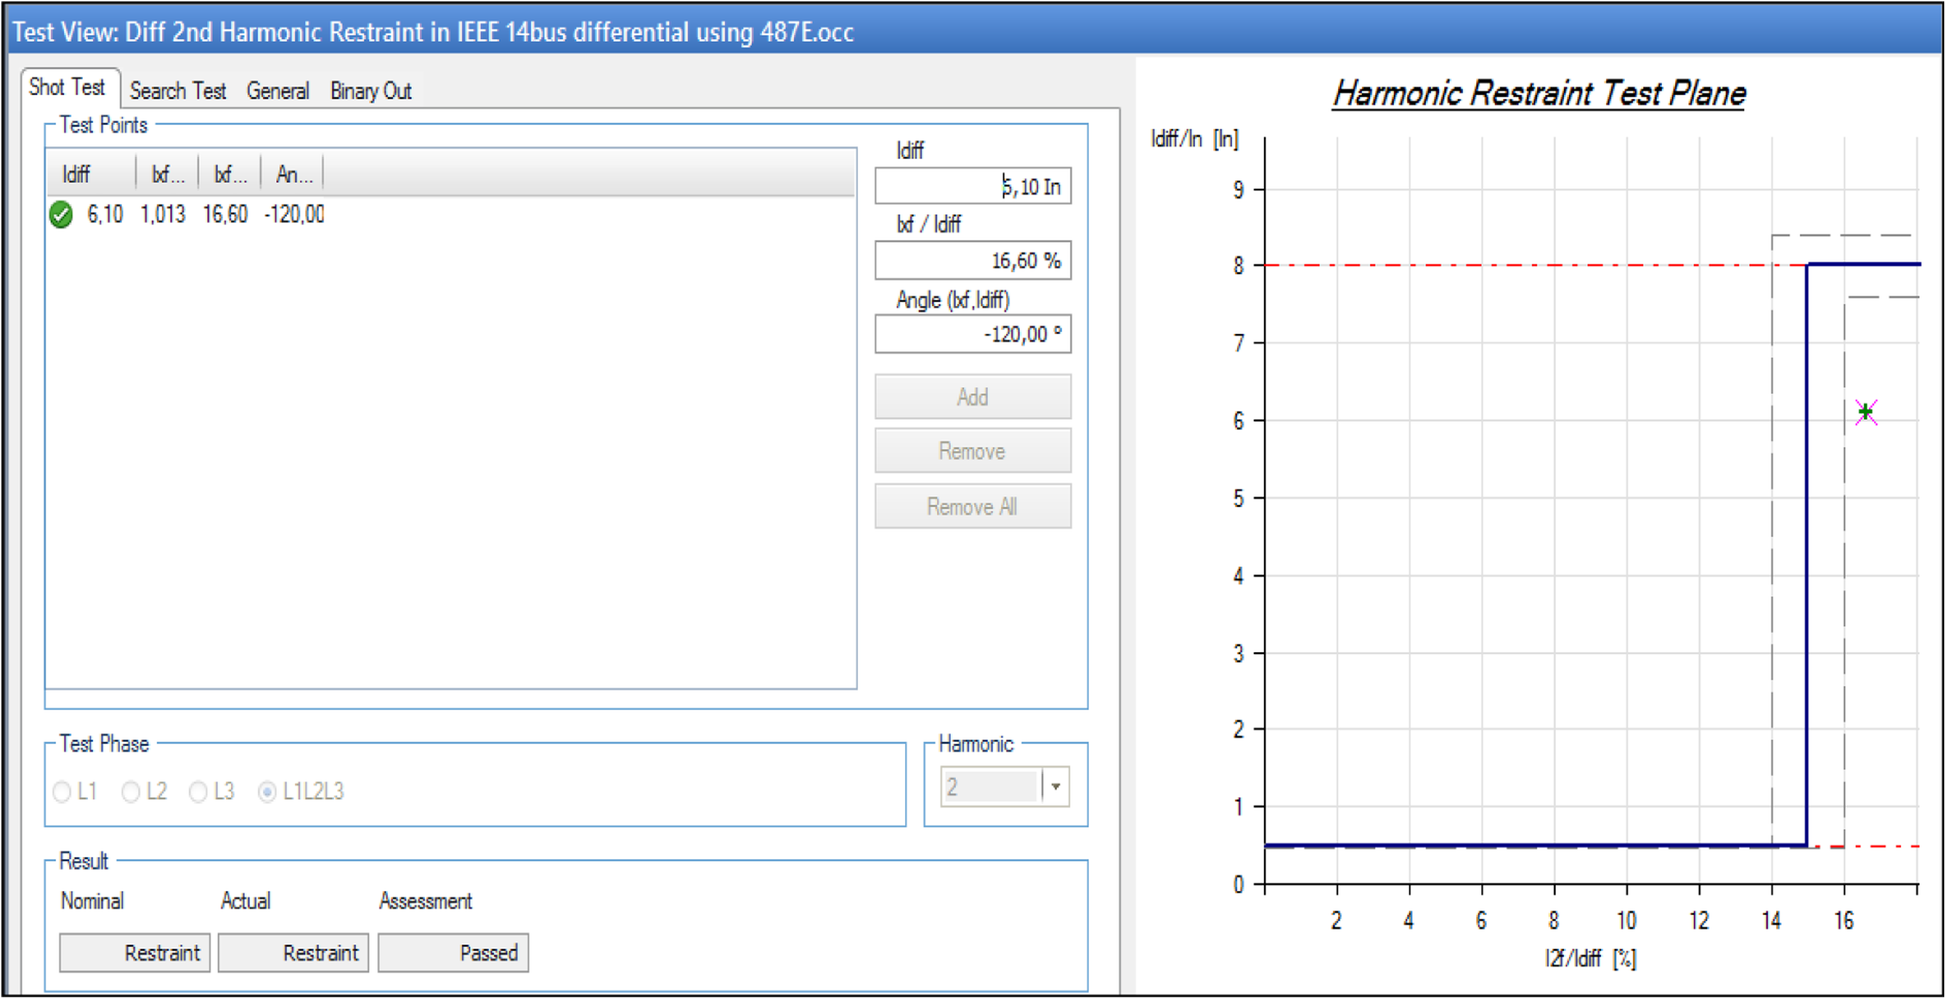 IEC61850 standard-based harmonic blocking scheme for power